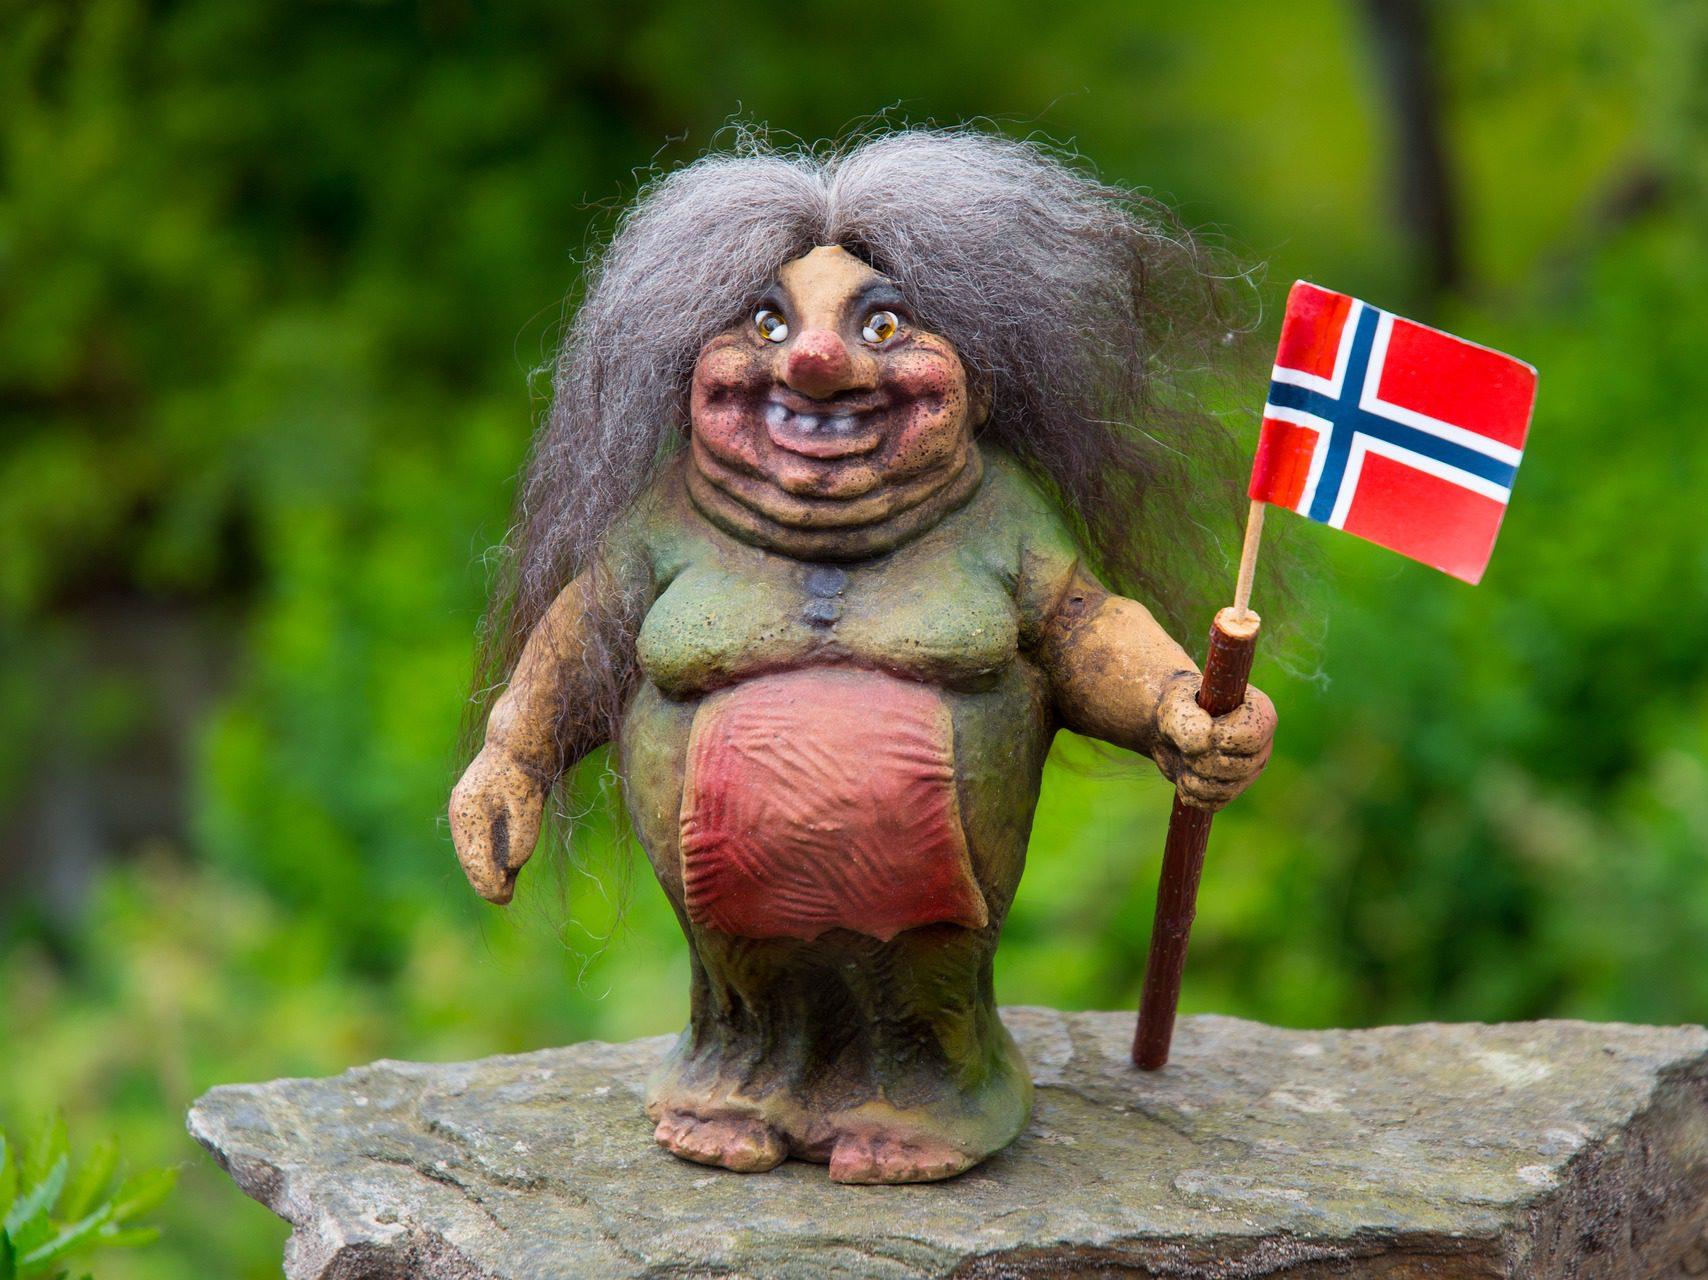 Noorwegen-Troll-Cruisemarkt.eu